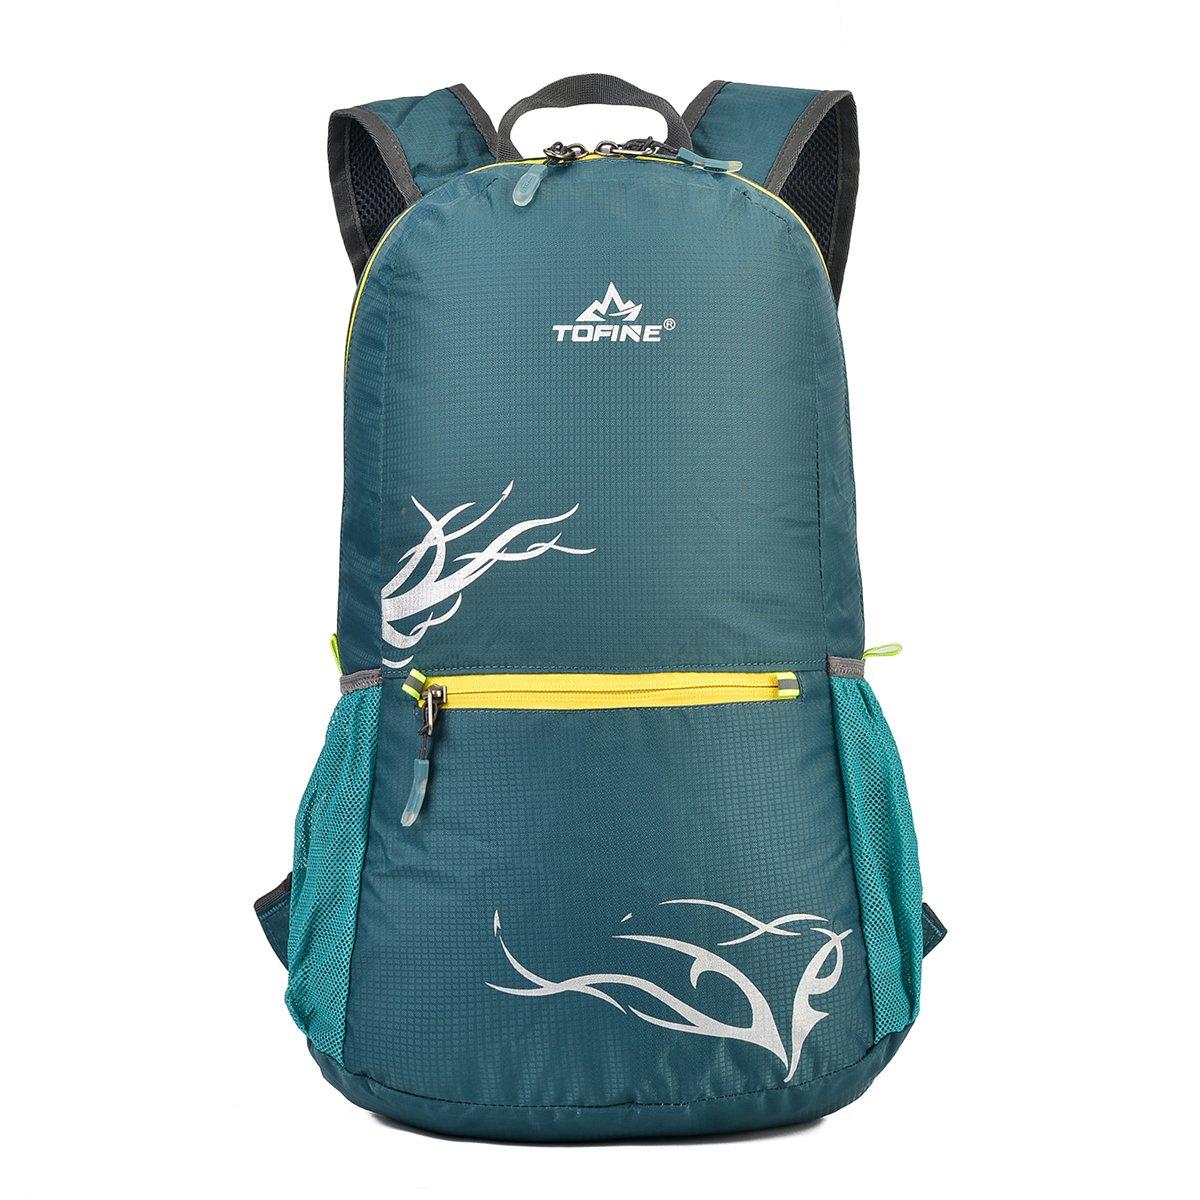 2d633045013a Amazon.com : Tofine Running Backpack Mini Lightweight Water ...